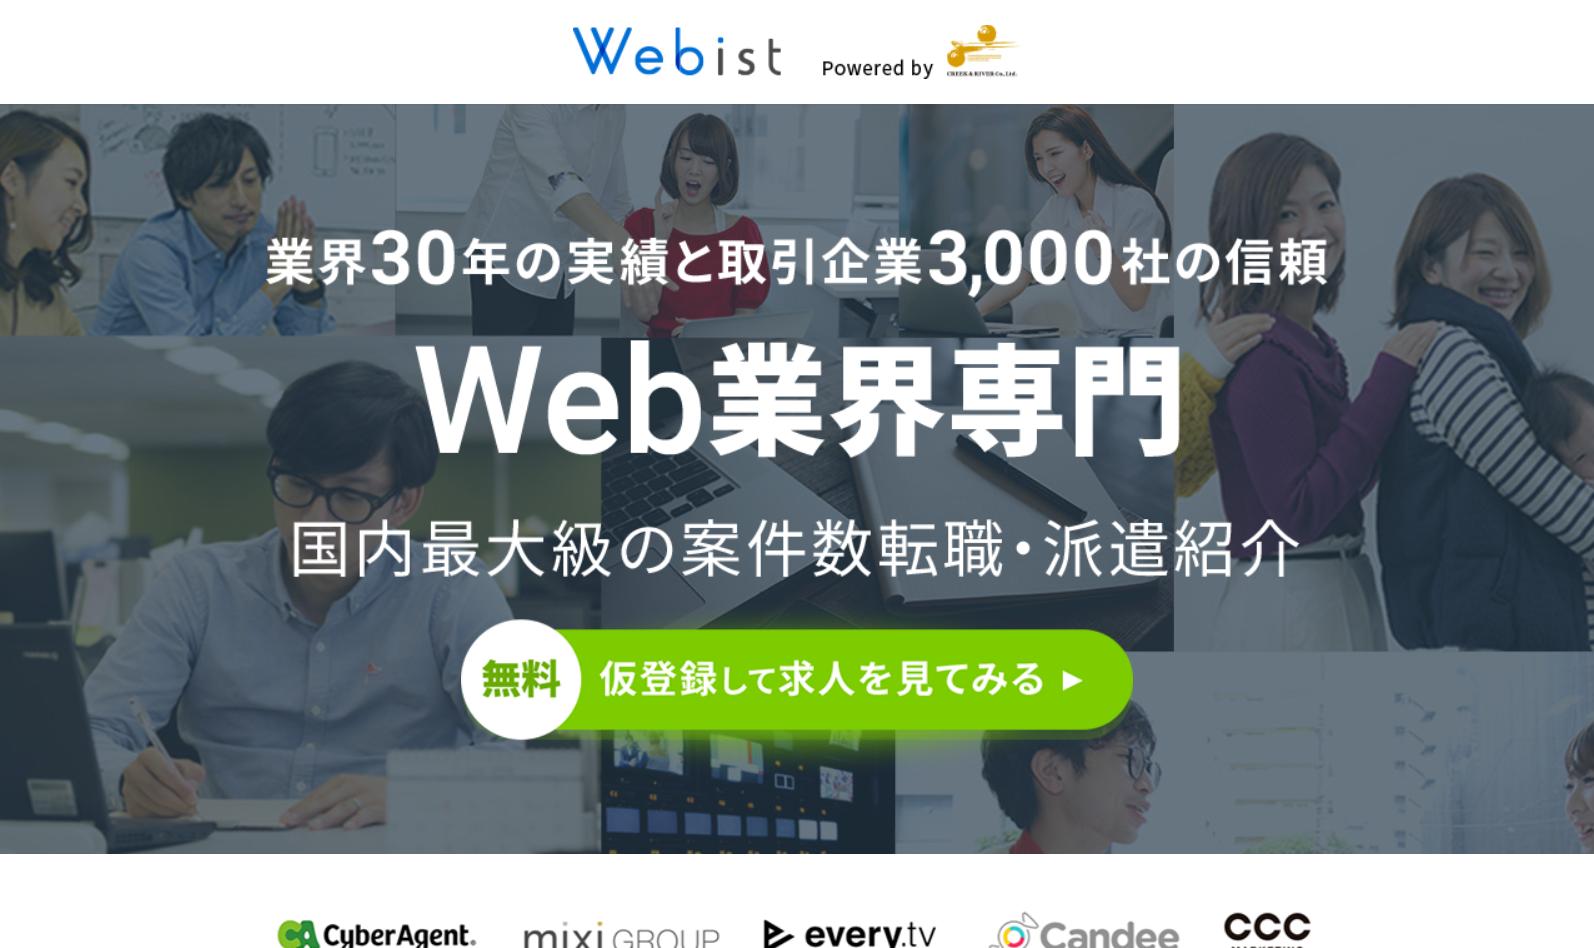 Webist